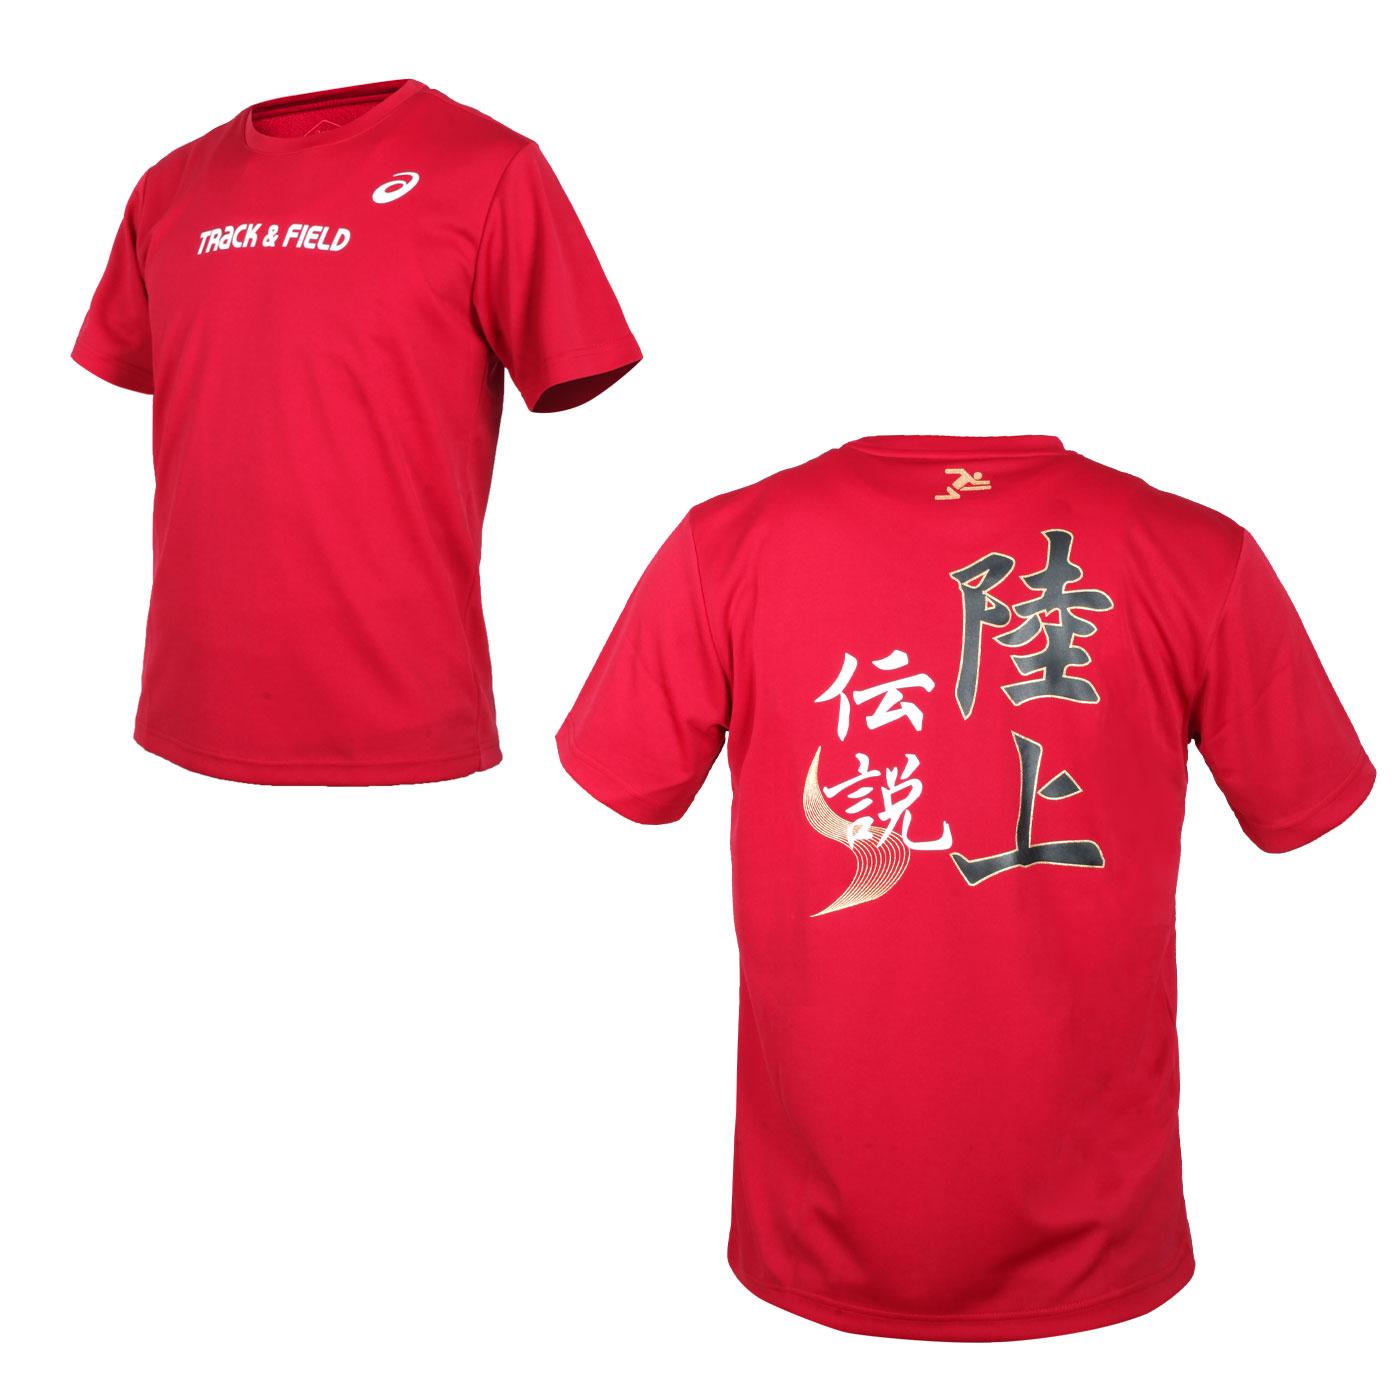 ASICS 男款短袖T恤 2093A129-600